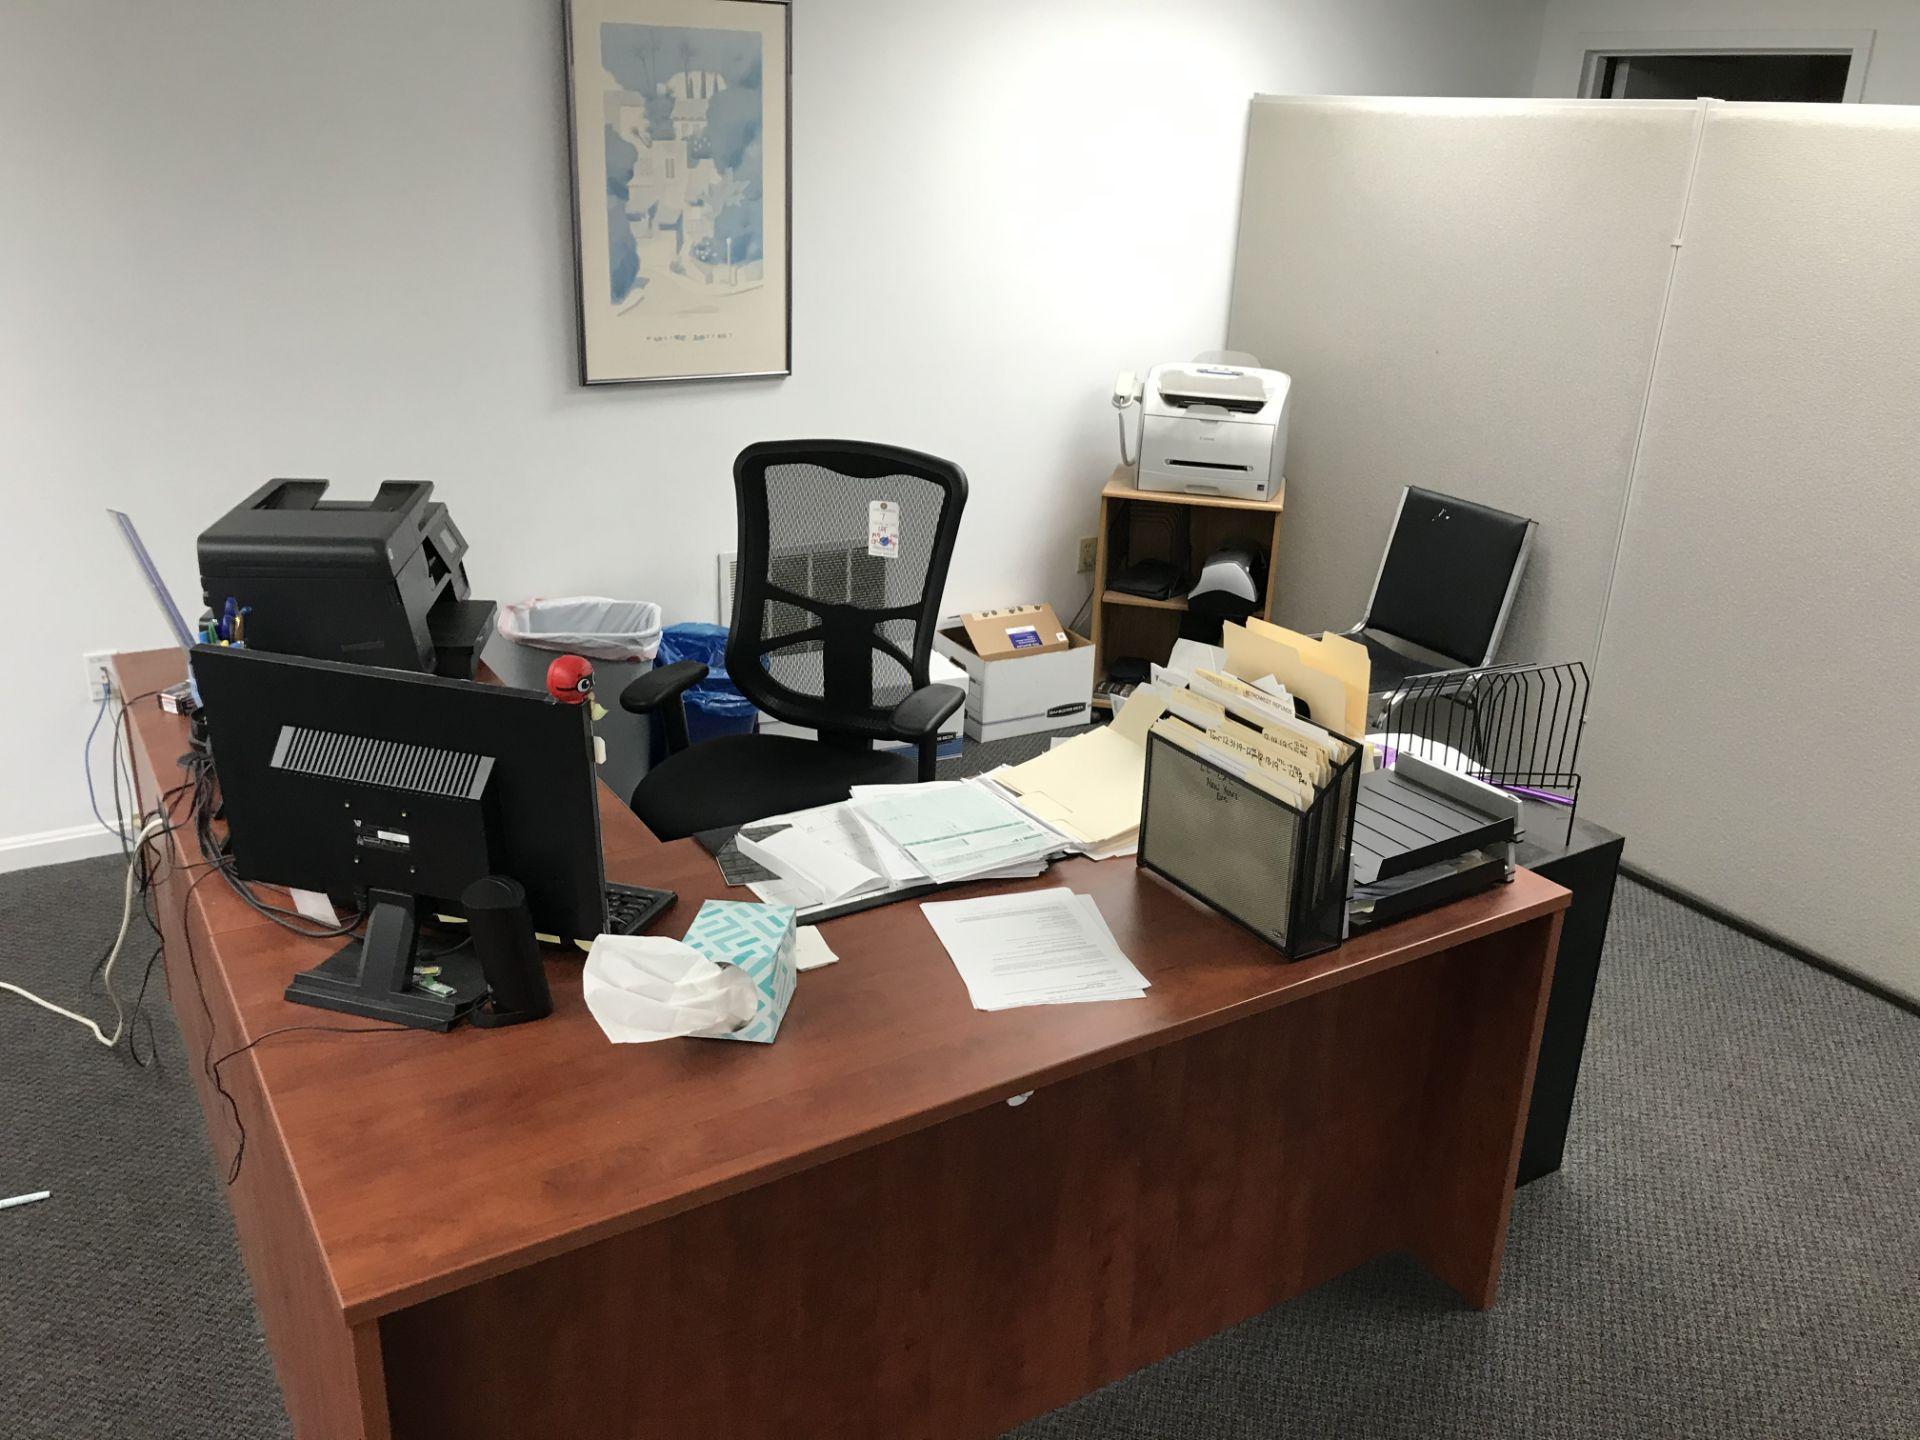 Lot 7 - {LOT} In Common Area c/o: L Shaped Desk, Chairs, Monitor, Printer, All in One, Partiton, (NO CPU, NO